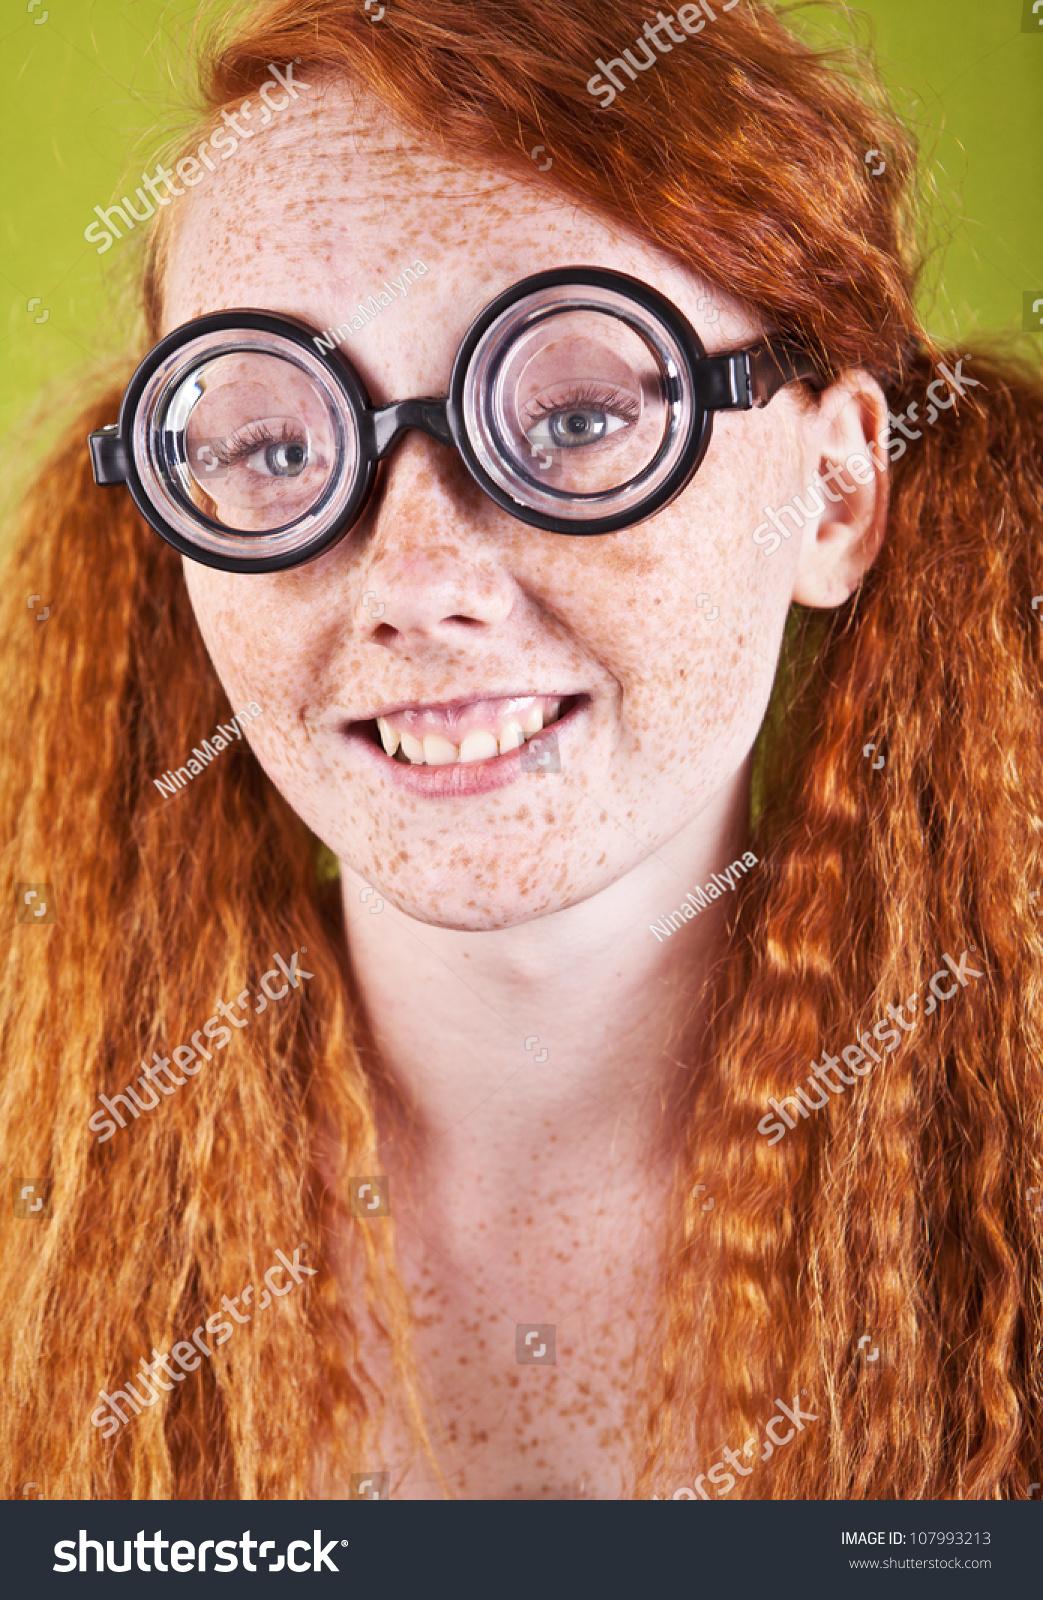 Idiot Nerd Girl | Know Your Meme